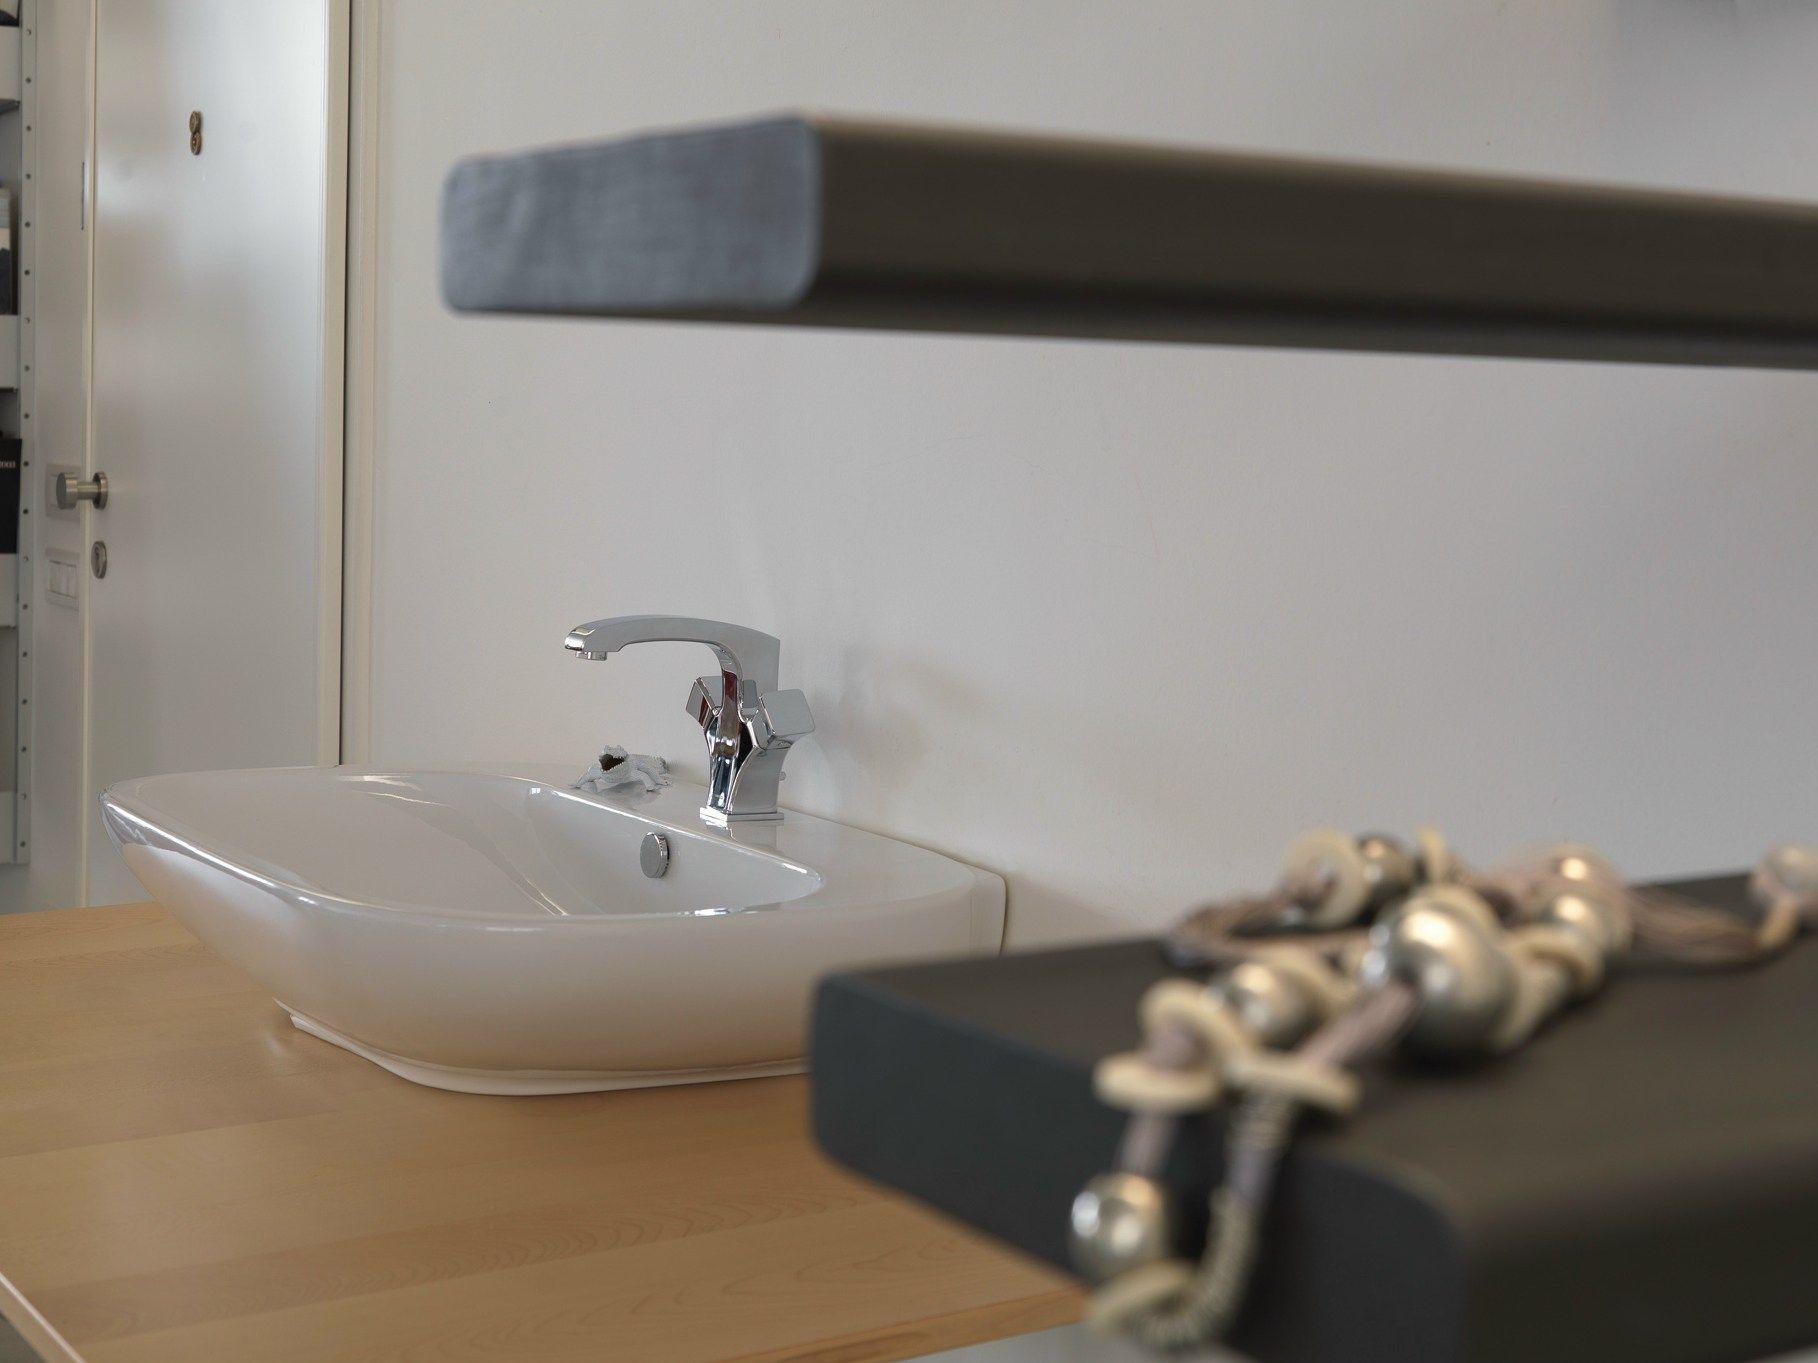 CLASS-X Rubinetto per lavabo by NEWFORM | CLASS-X | Bath collections ...